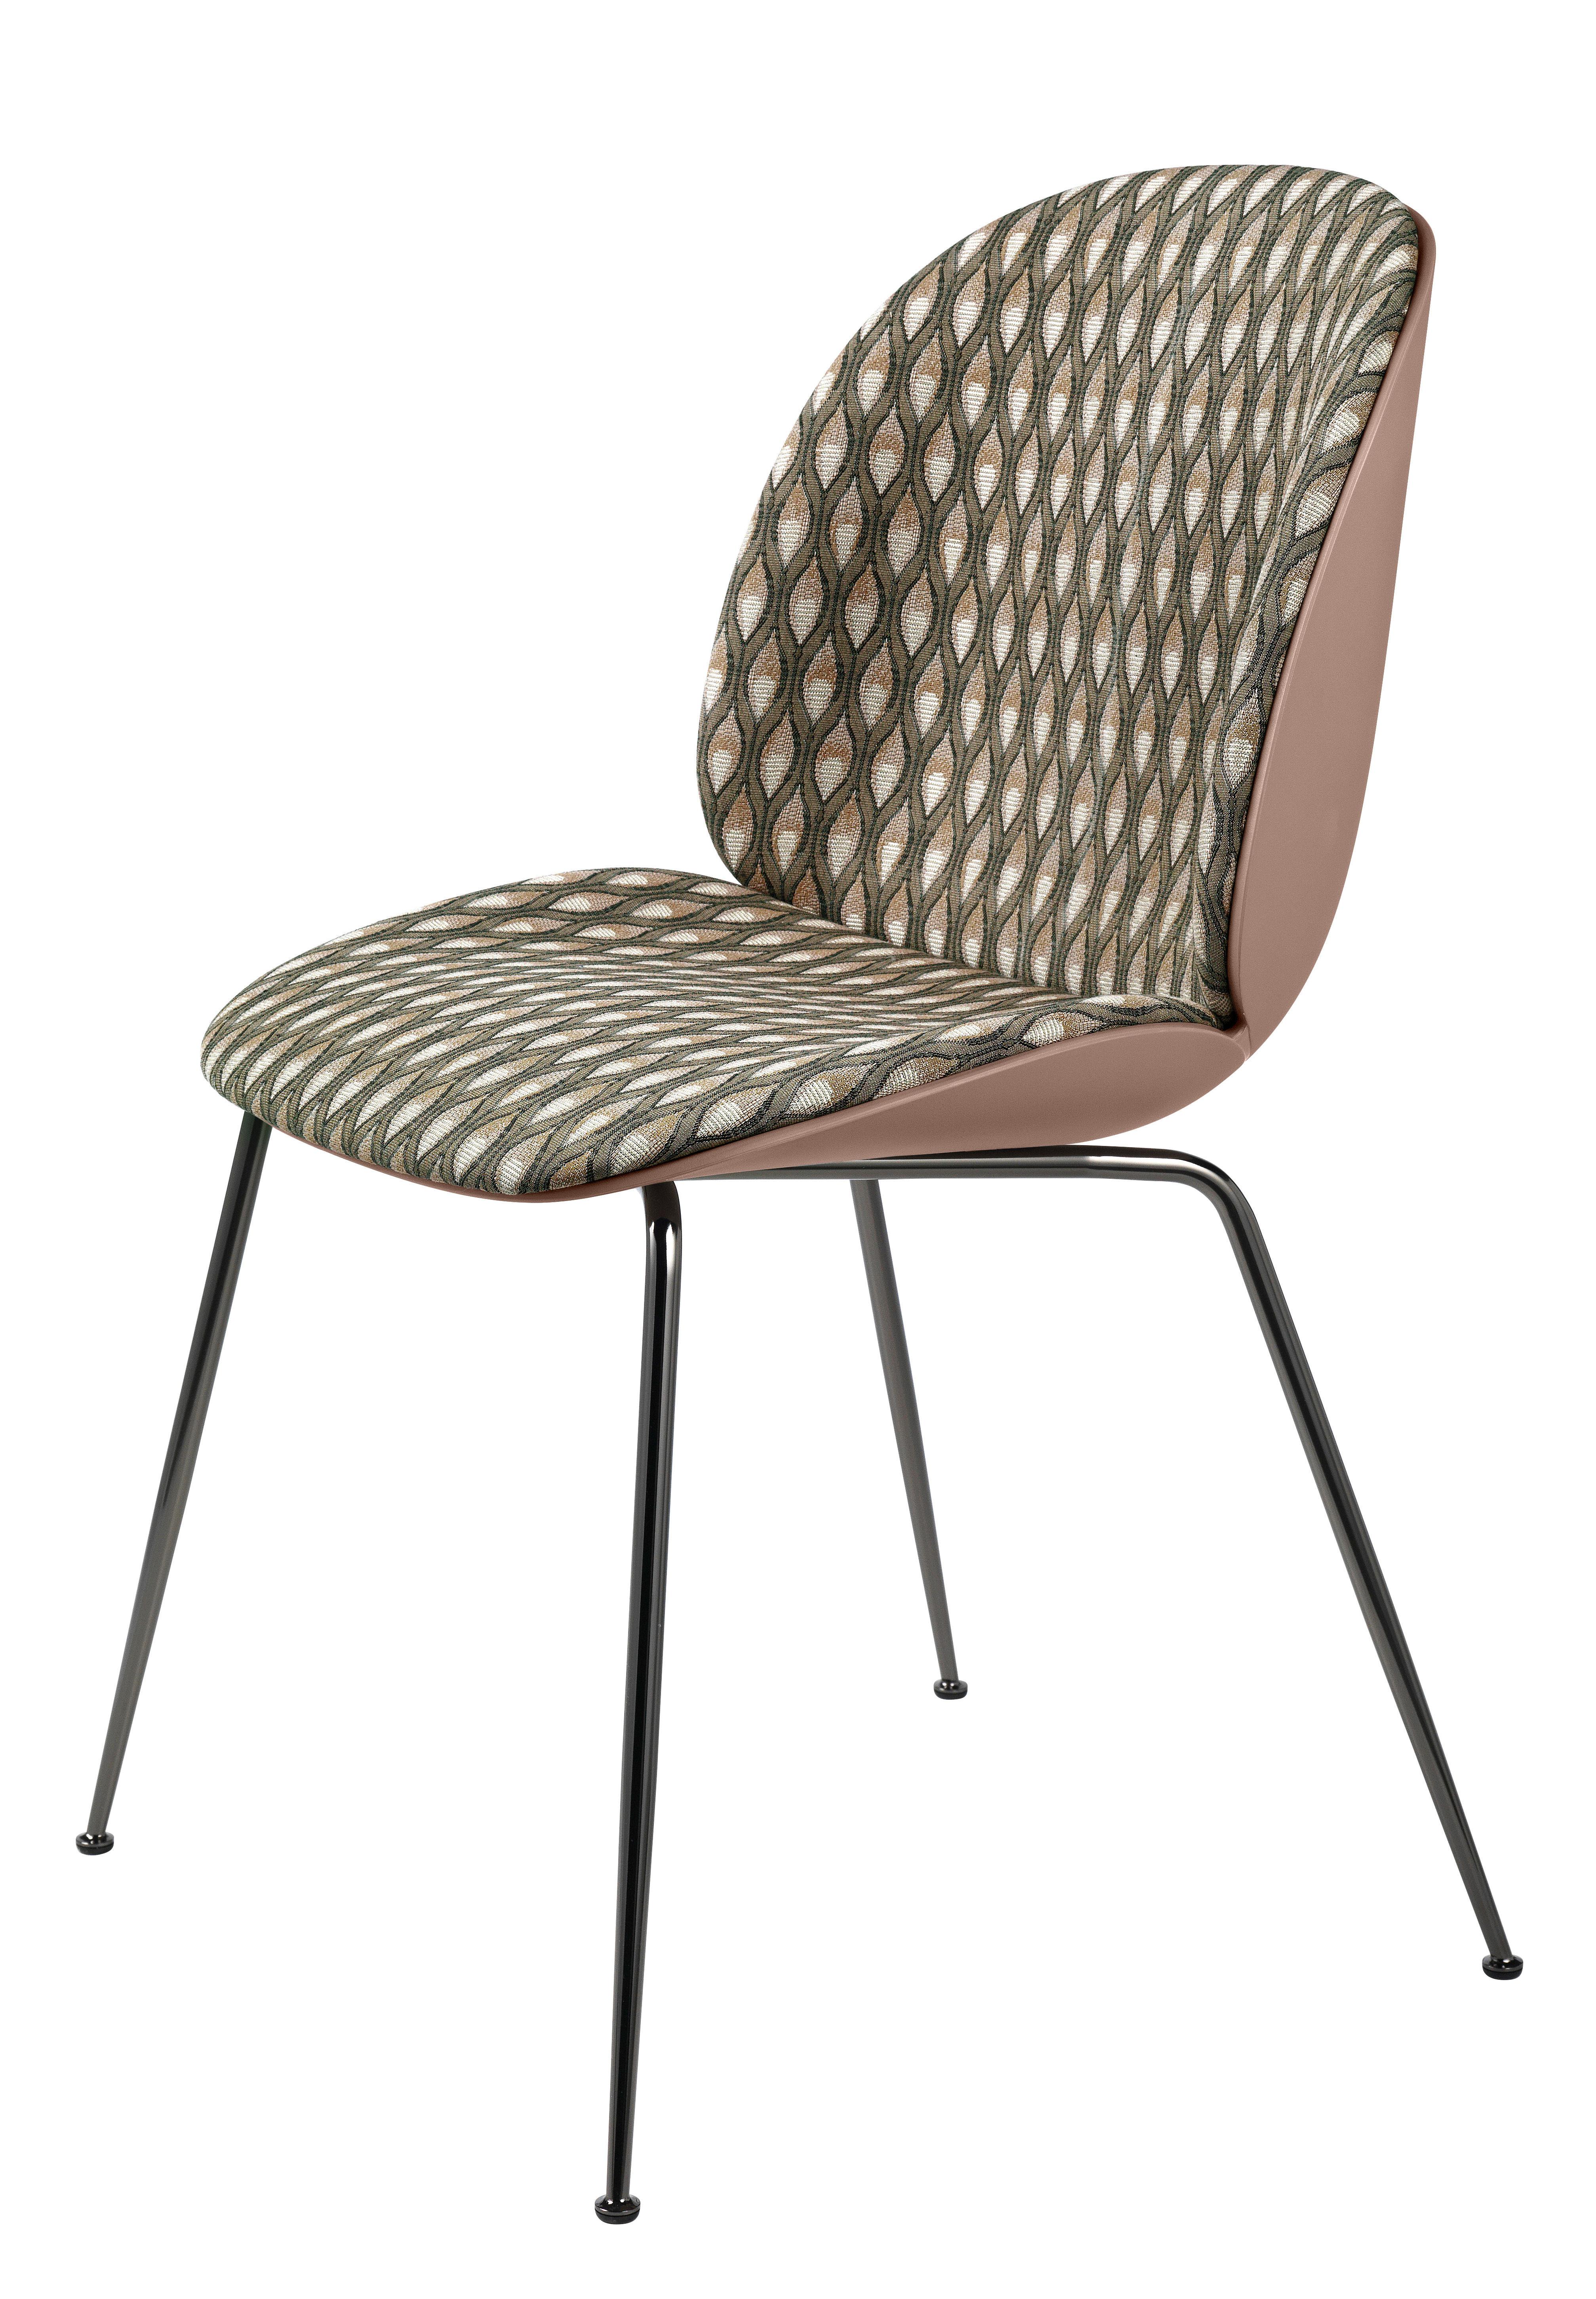 chaise rembourr e beetle gamfratesi plastique tissu beige rose pieds acier noir gubi. Black Bedroom Furniture Sets. Home Design Ideas